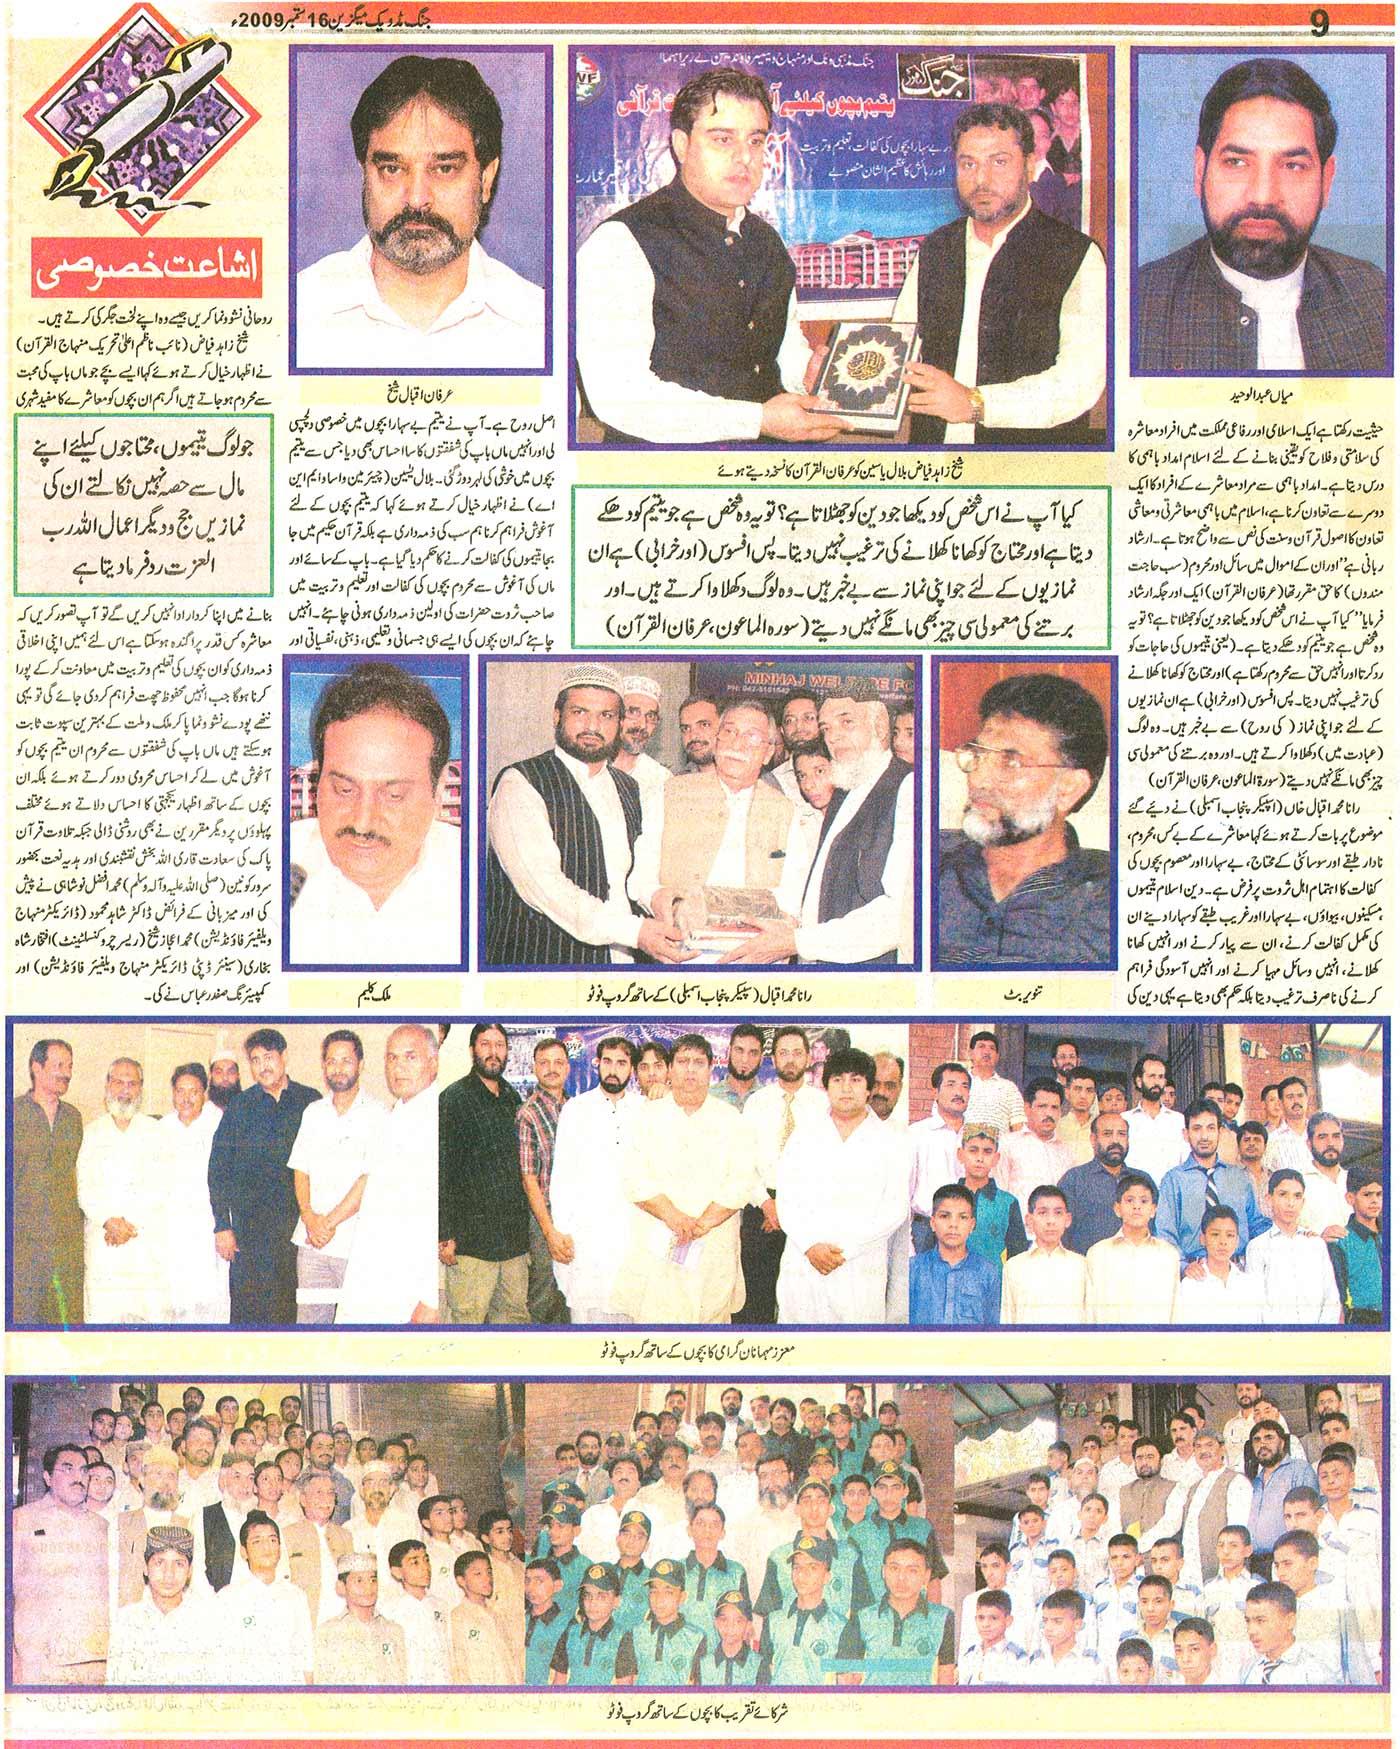 تحریک منہاج القرآن Minhaj-ul-Quran  Print Media Coverage پرنٹ میڈیا کوریج Jang Midweek Magazine Page: 9